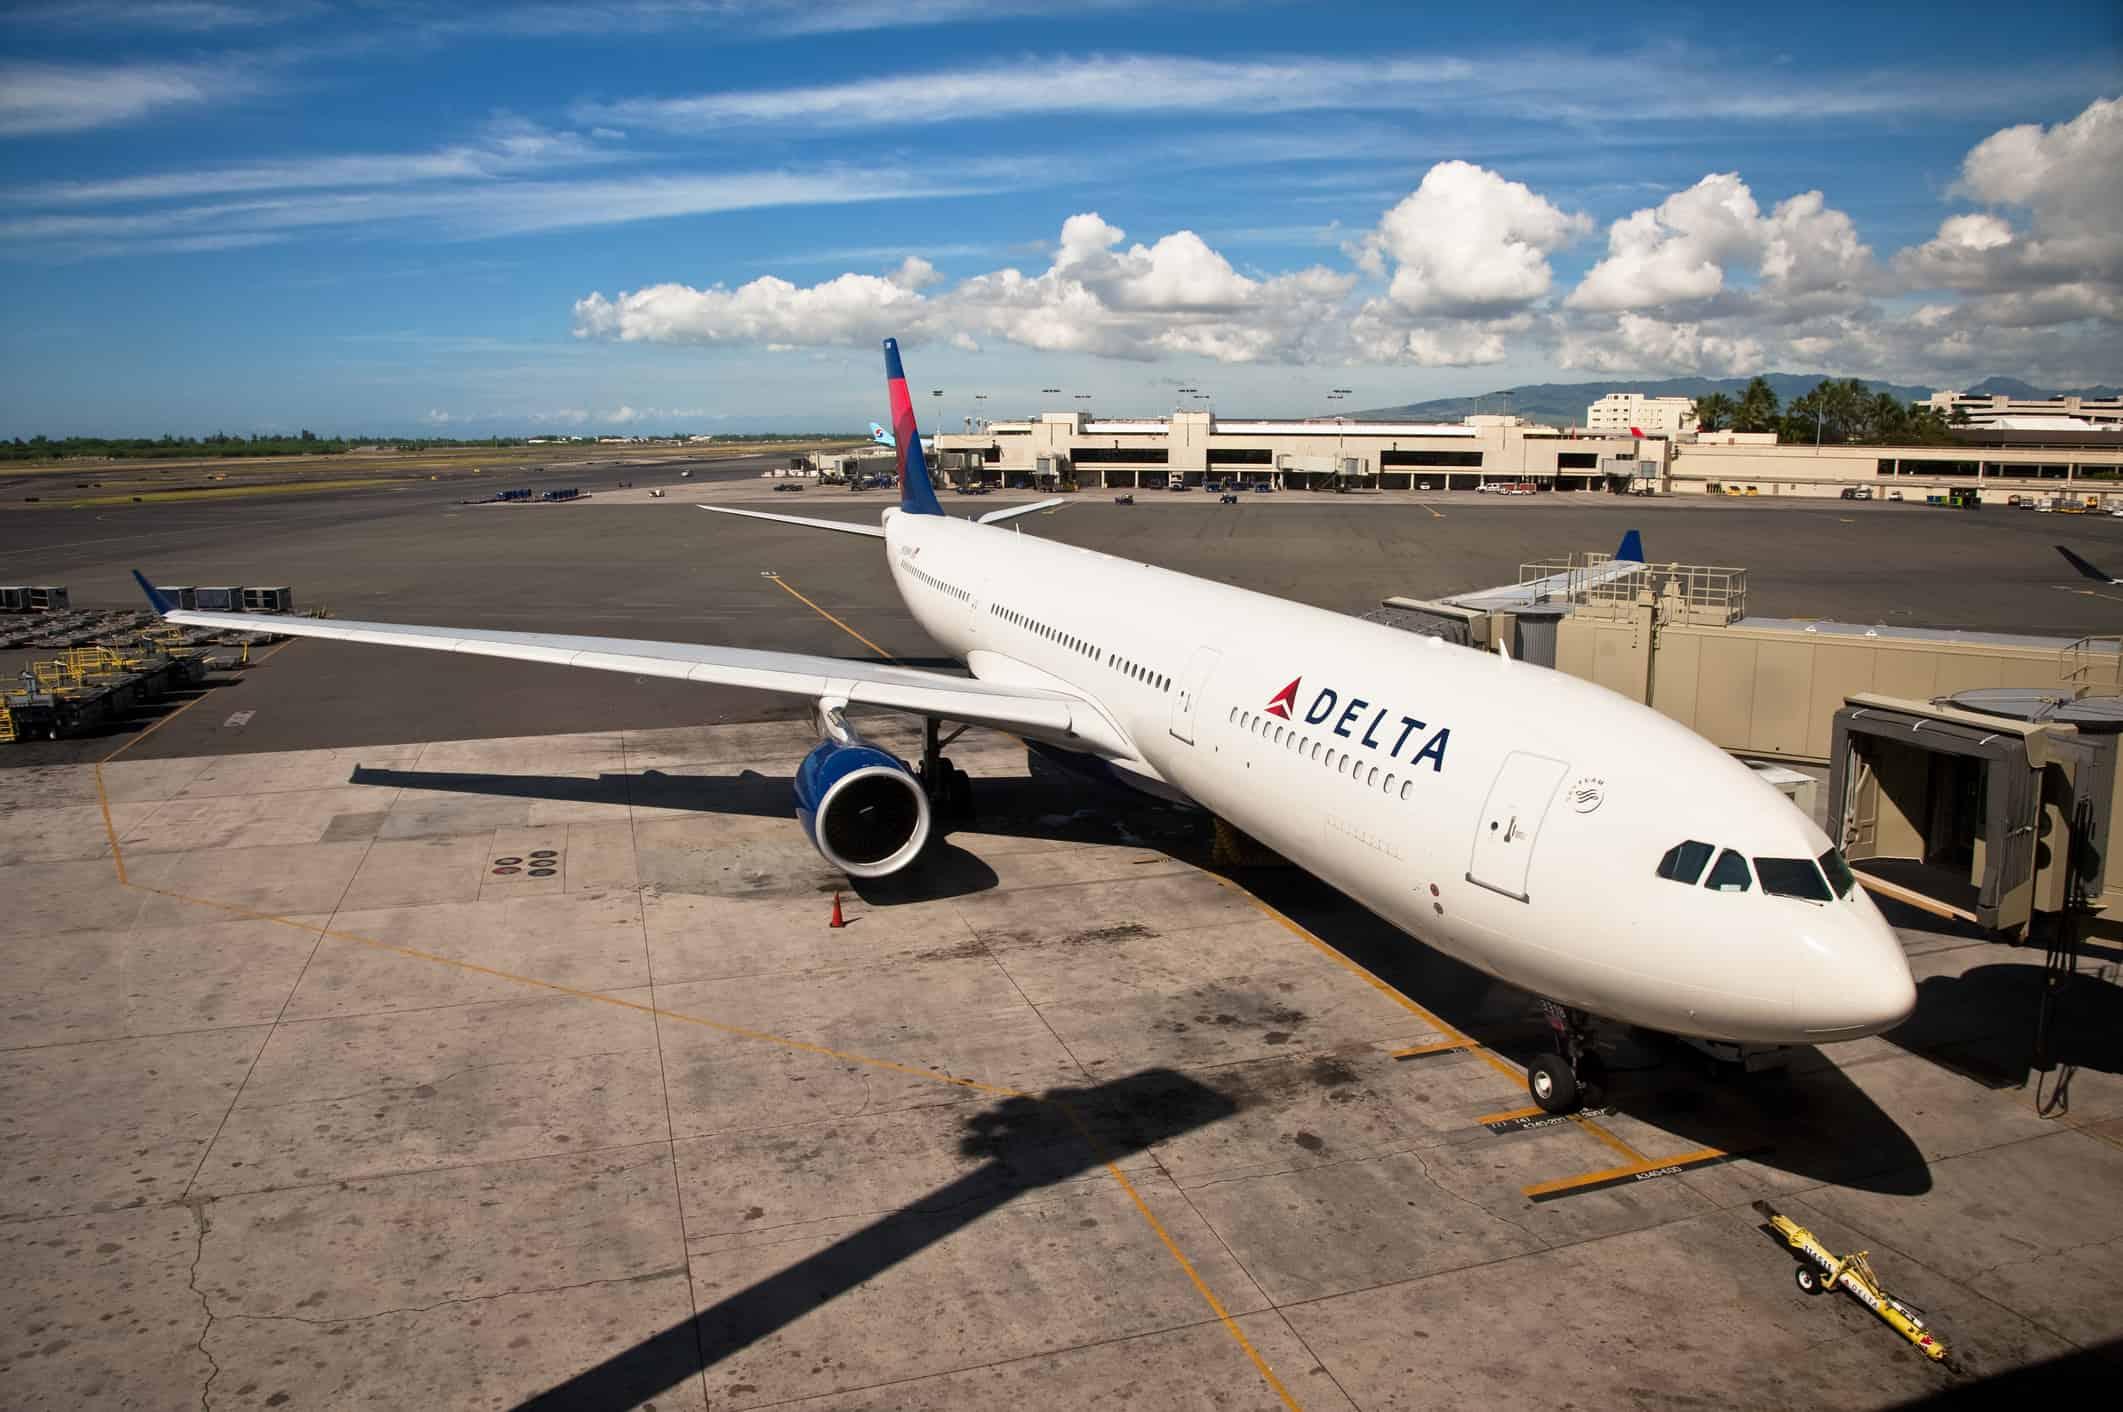 Delta Air Lines SkyMiles